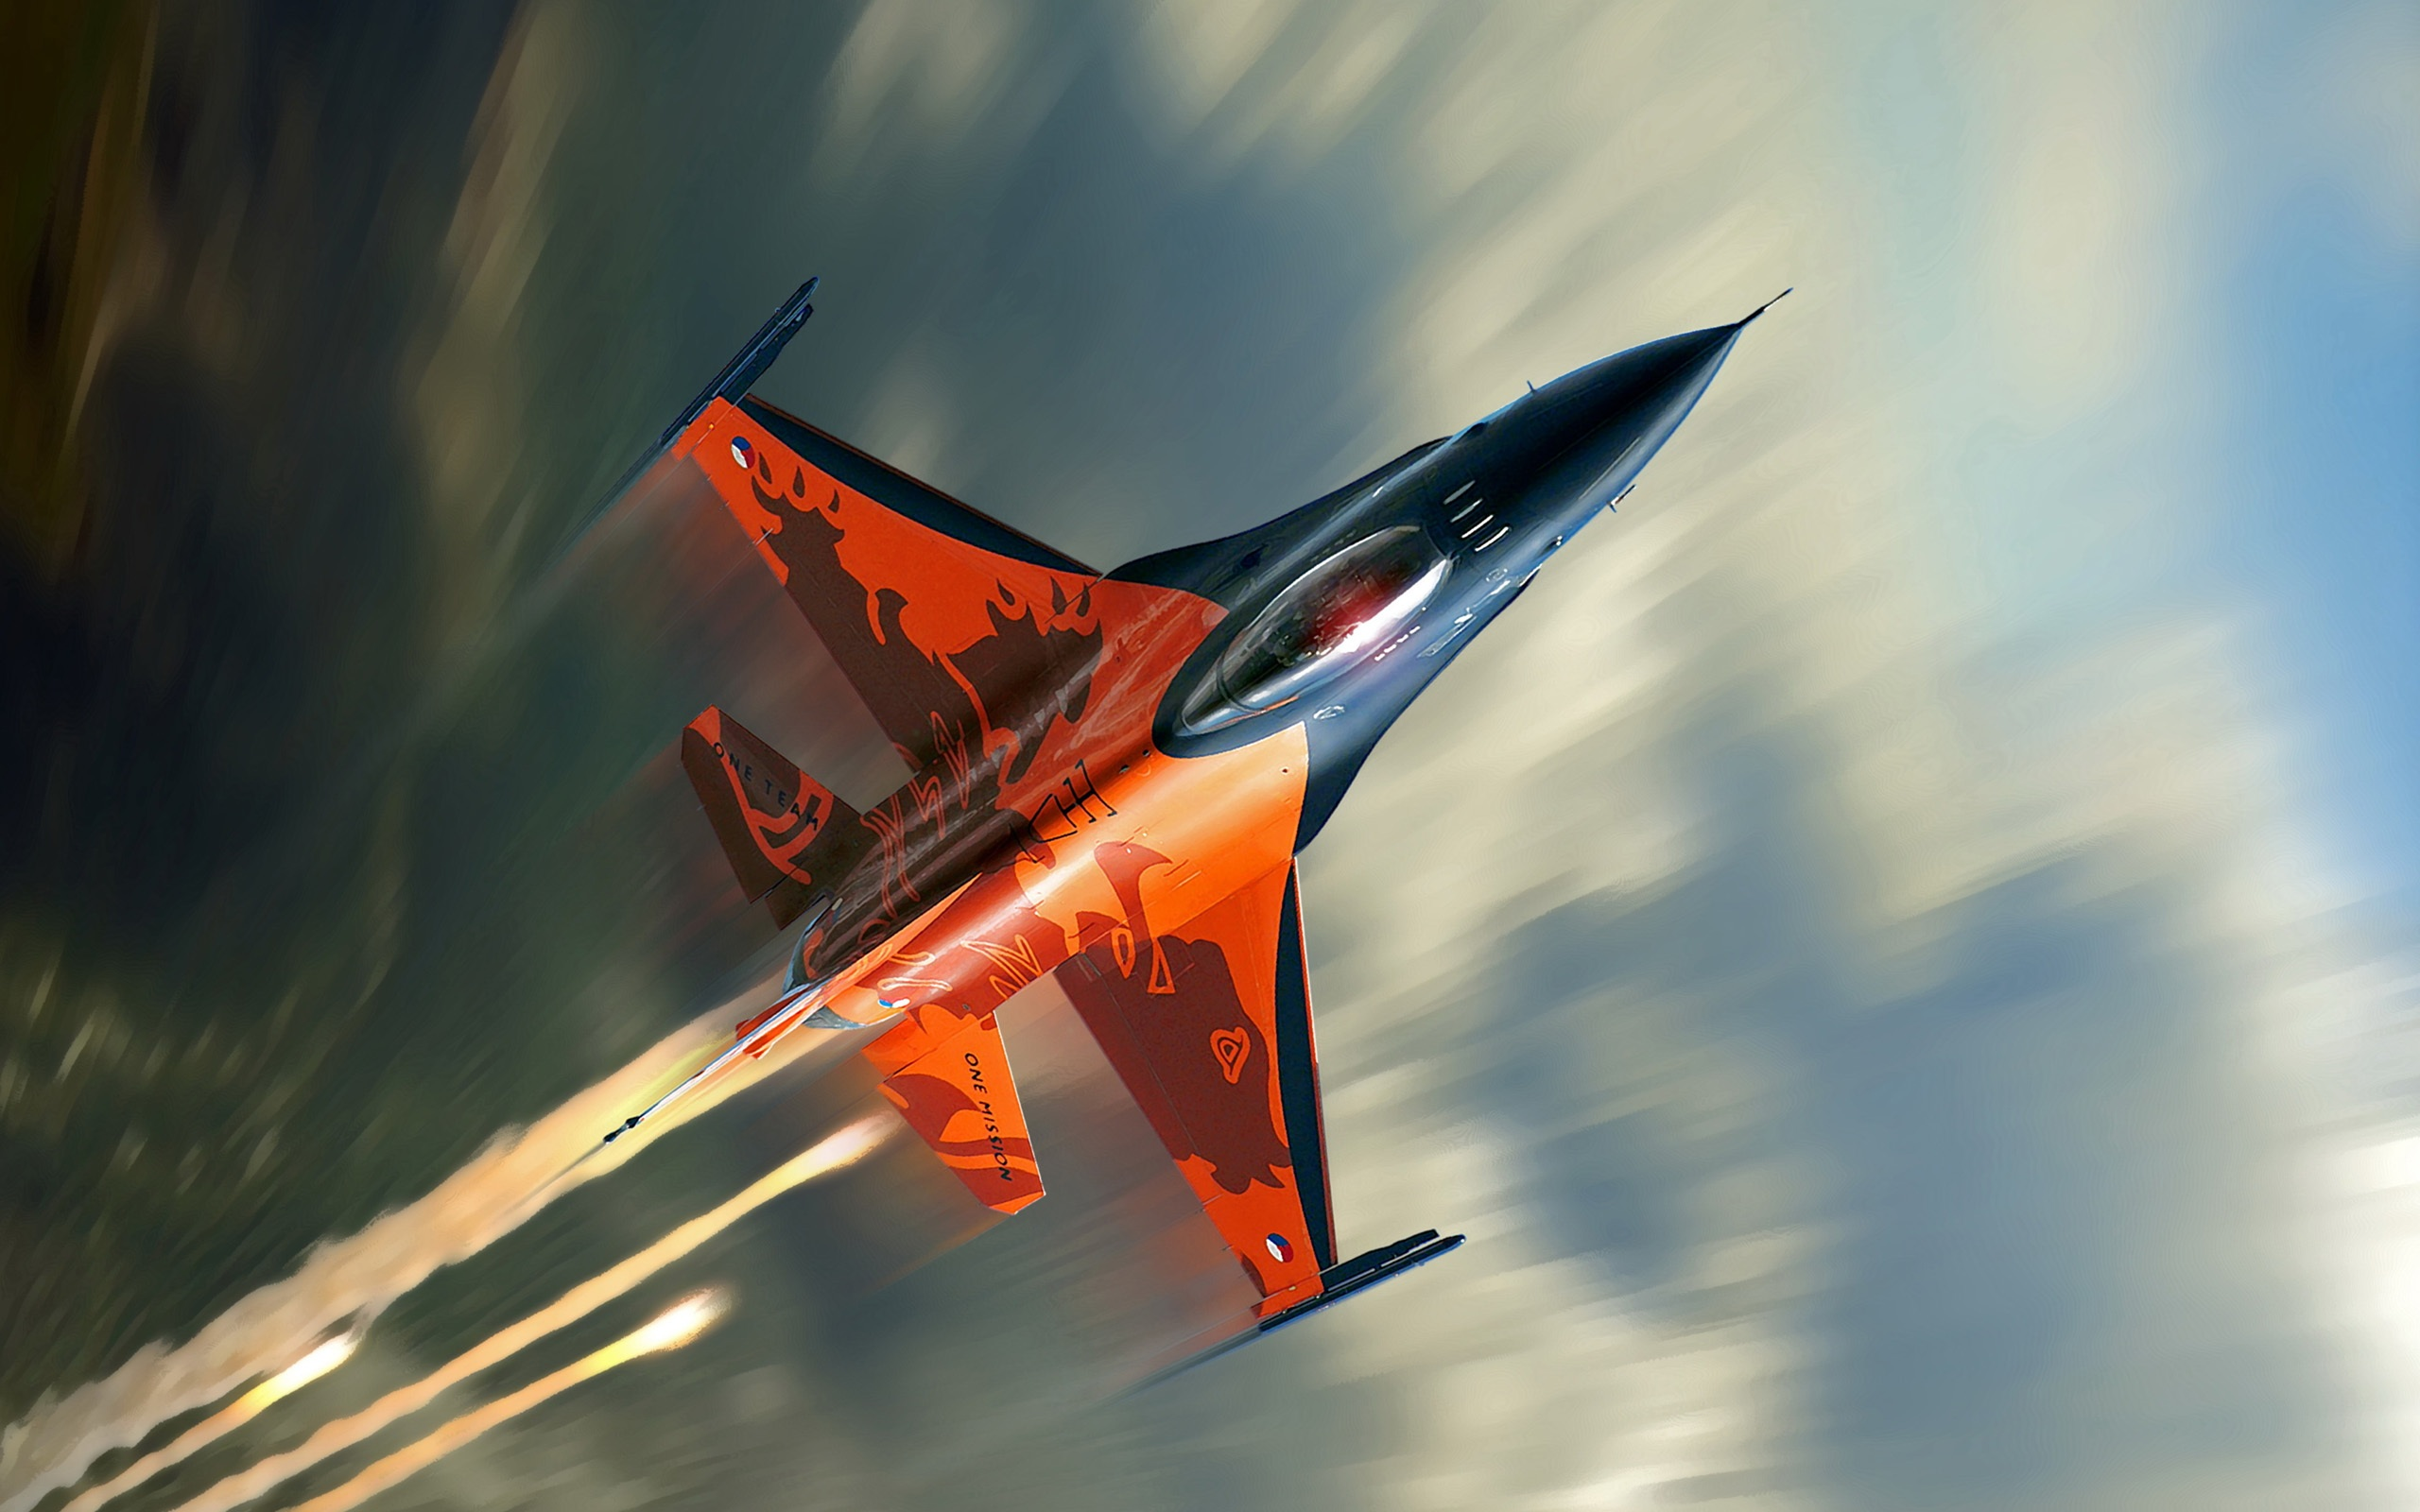 F 16 (戦闘機)の画像 p1_39